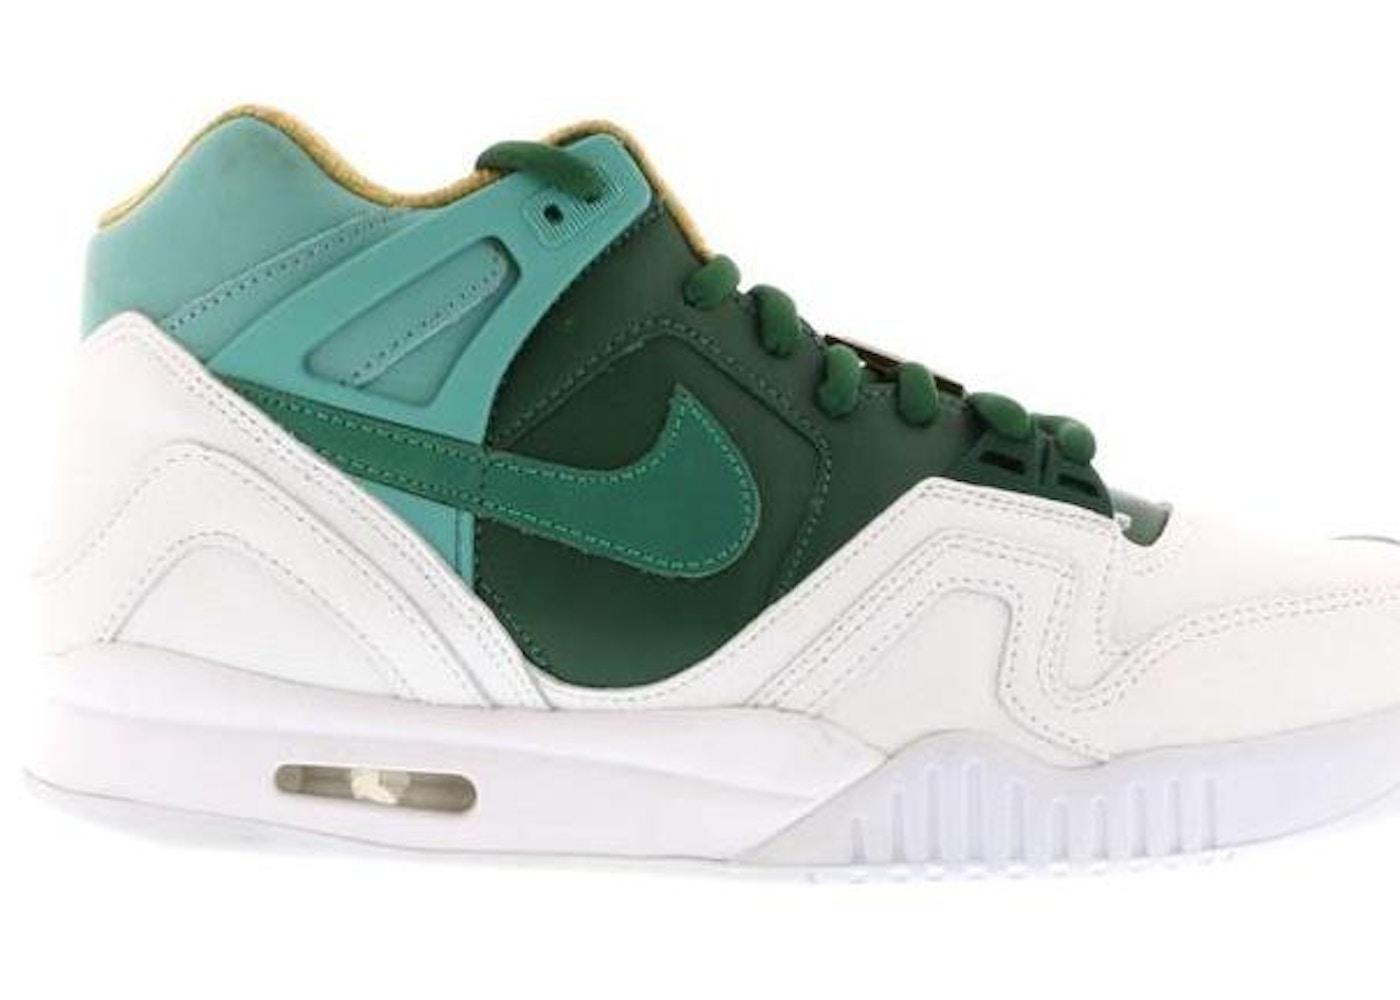 Nike Air Tech Challenge Ii Wimbeldon 2014 621358 133